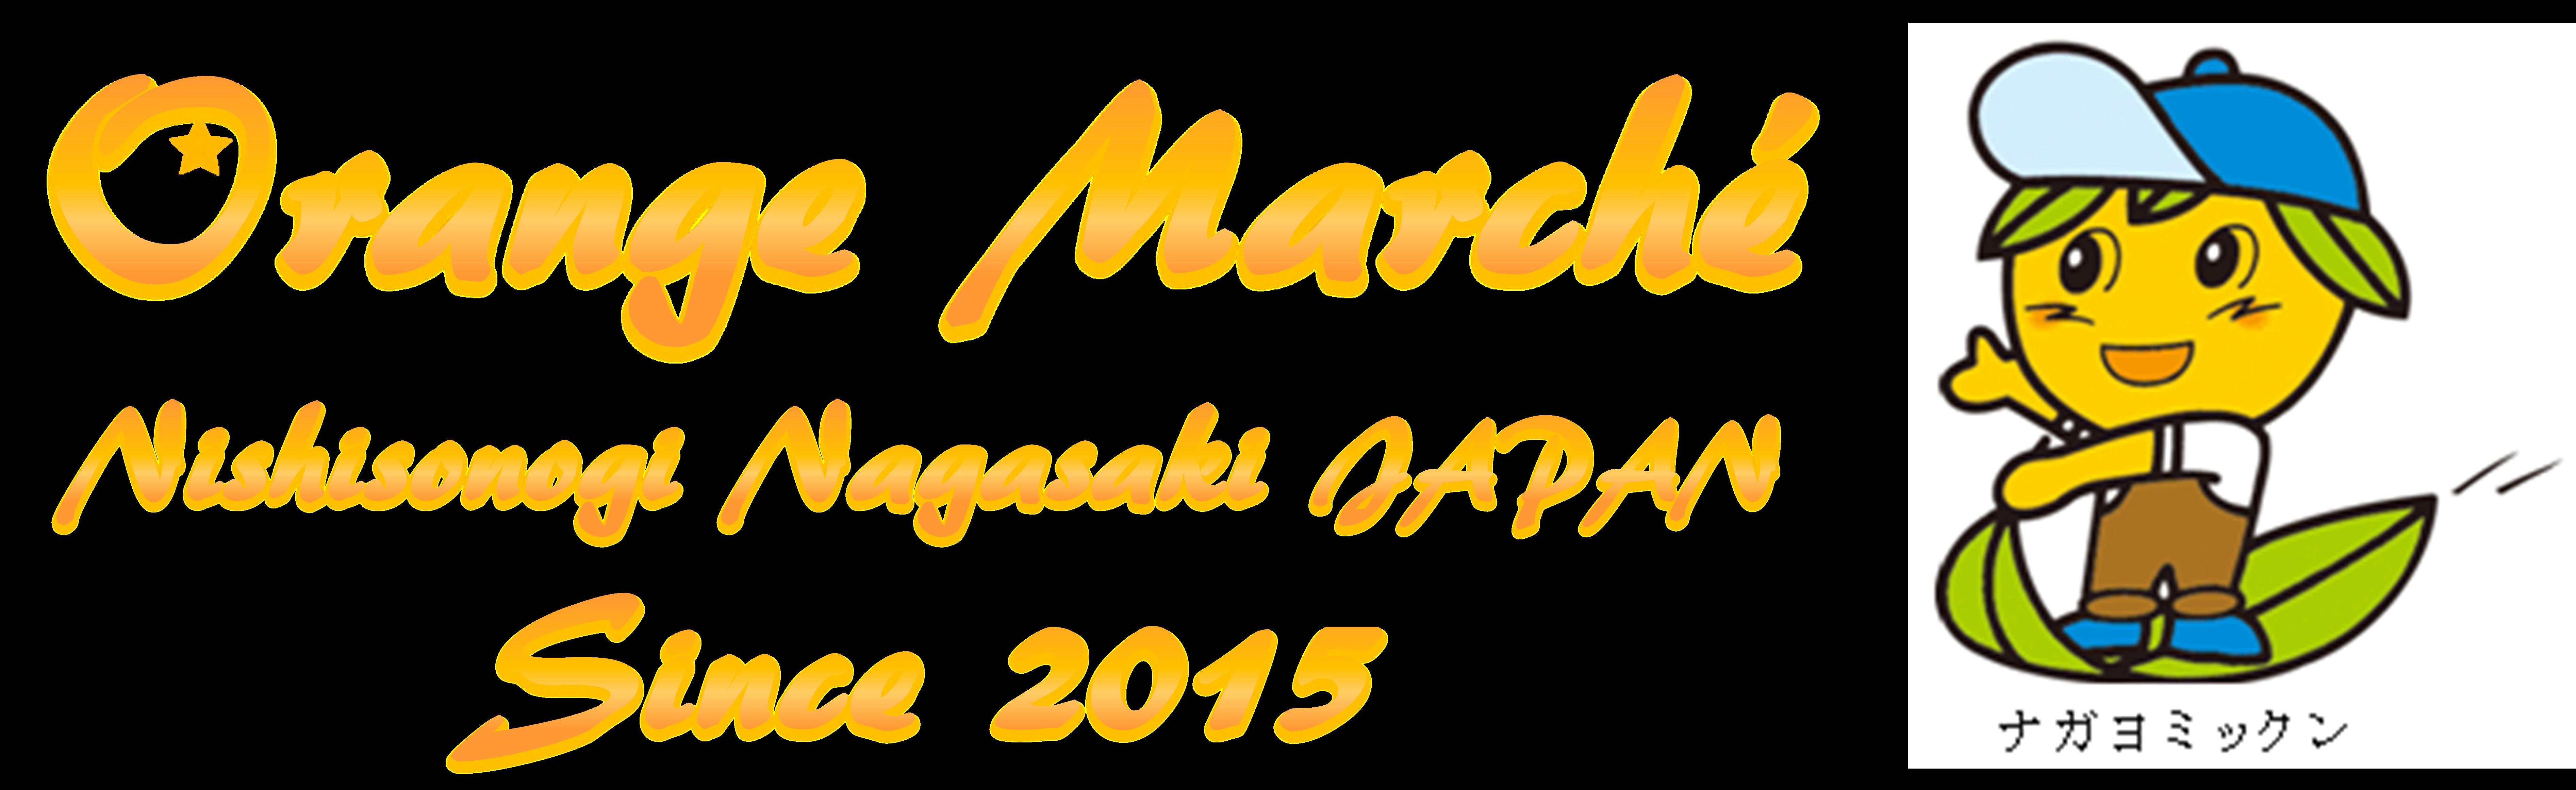 Orange Marche 3G(GIMP)